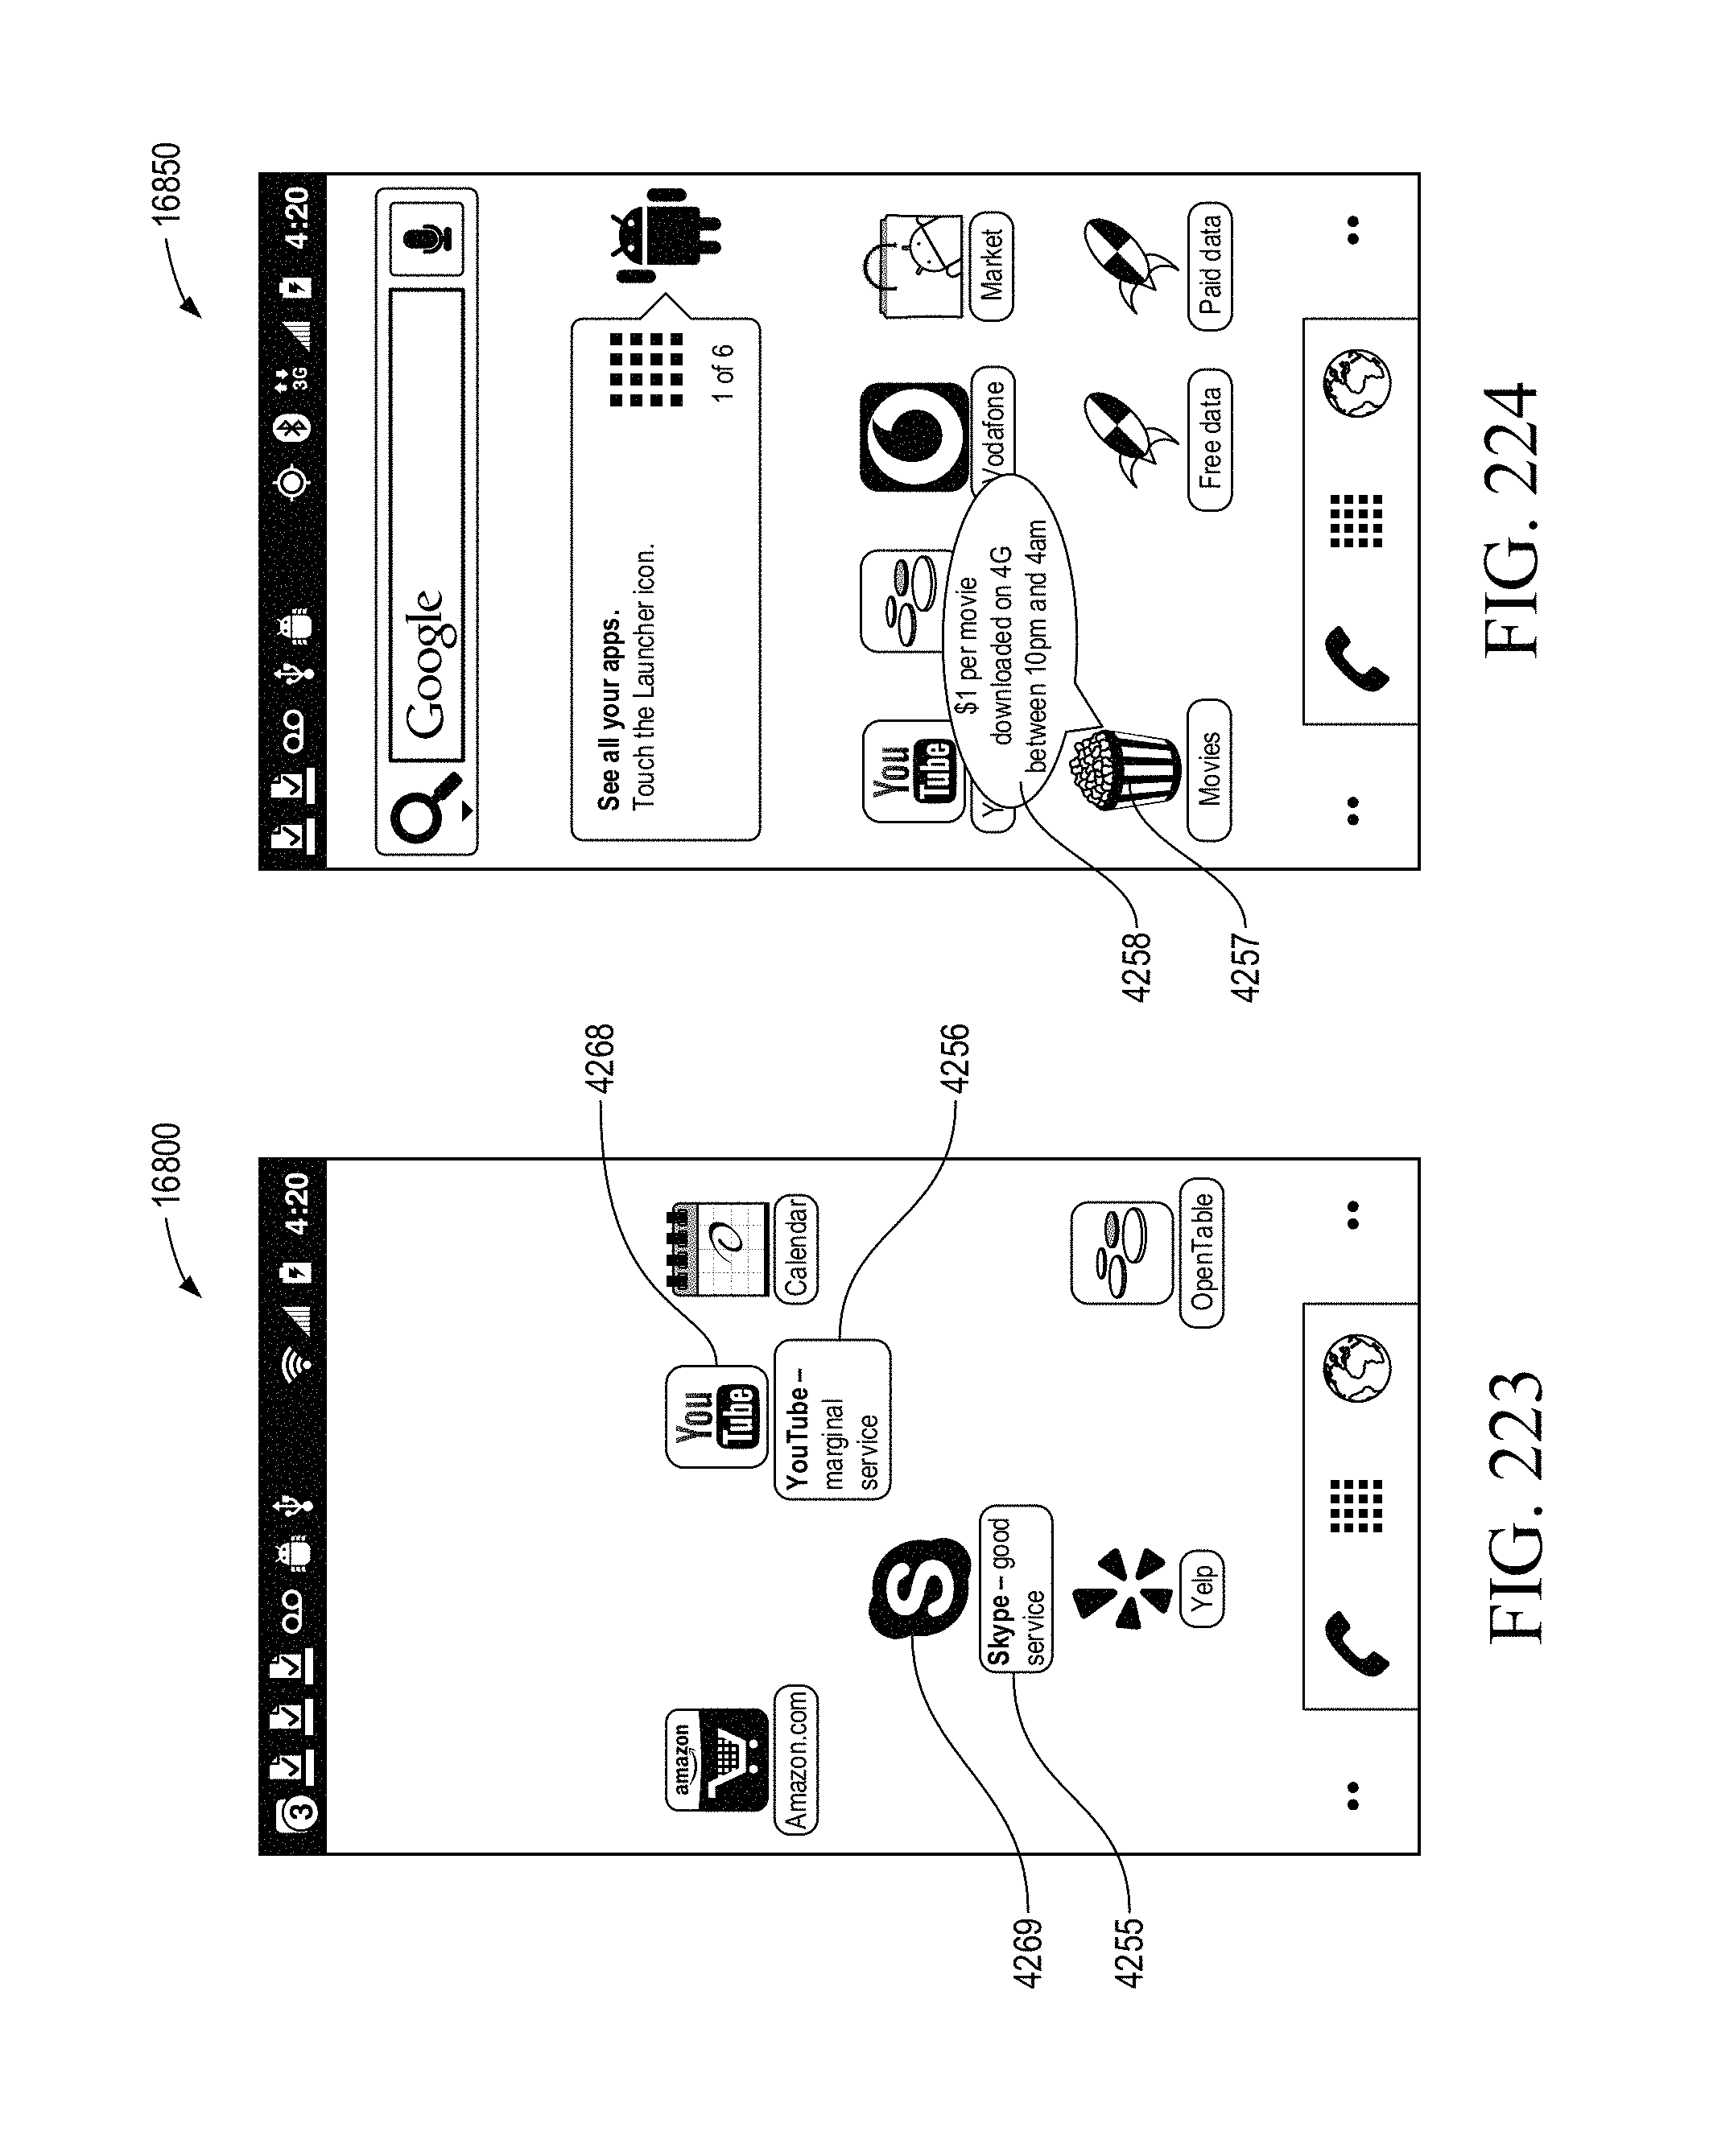 Basic Pushpull Converter Circuit Diagram Tradeoficcom Patent Us 9955332 B2